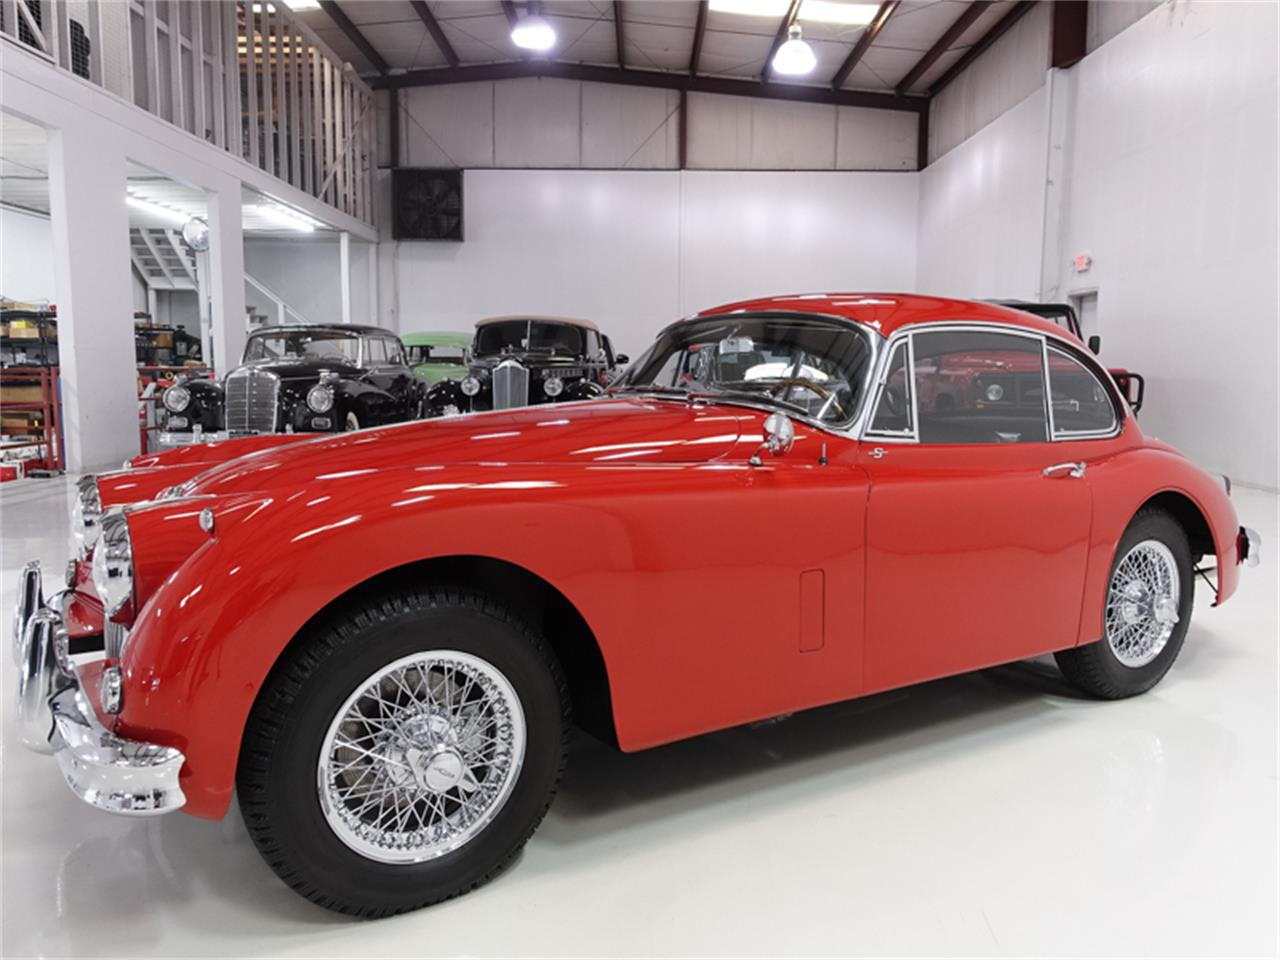 Wiring Harness Jaguar Xk150 Diagram Libraries Xk 150 Todays1961 For Sale Classiccars Com Cc 1087326